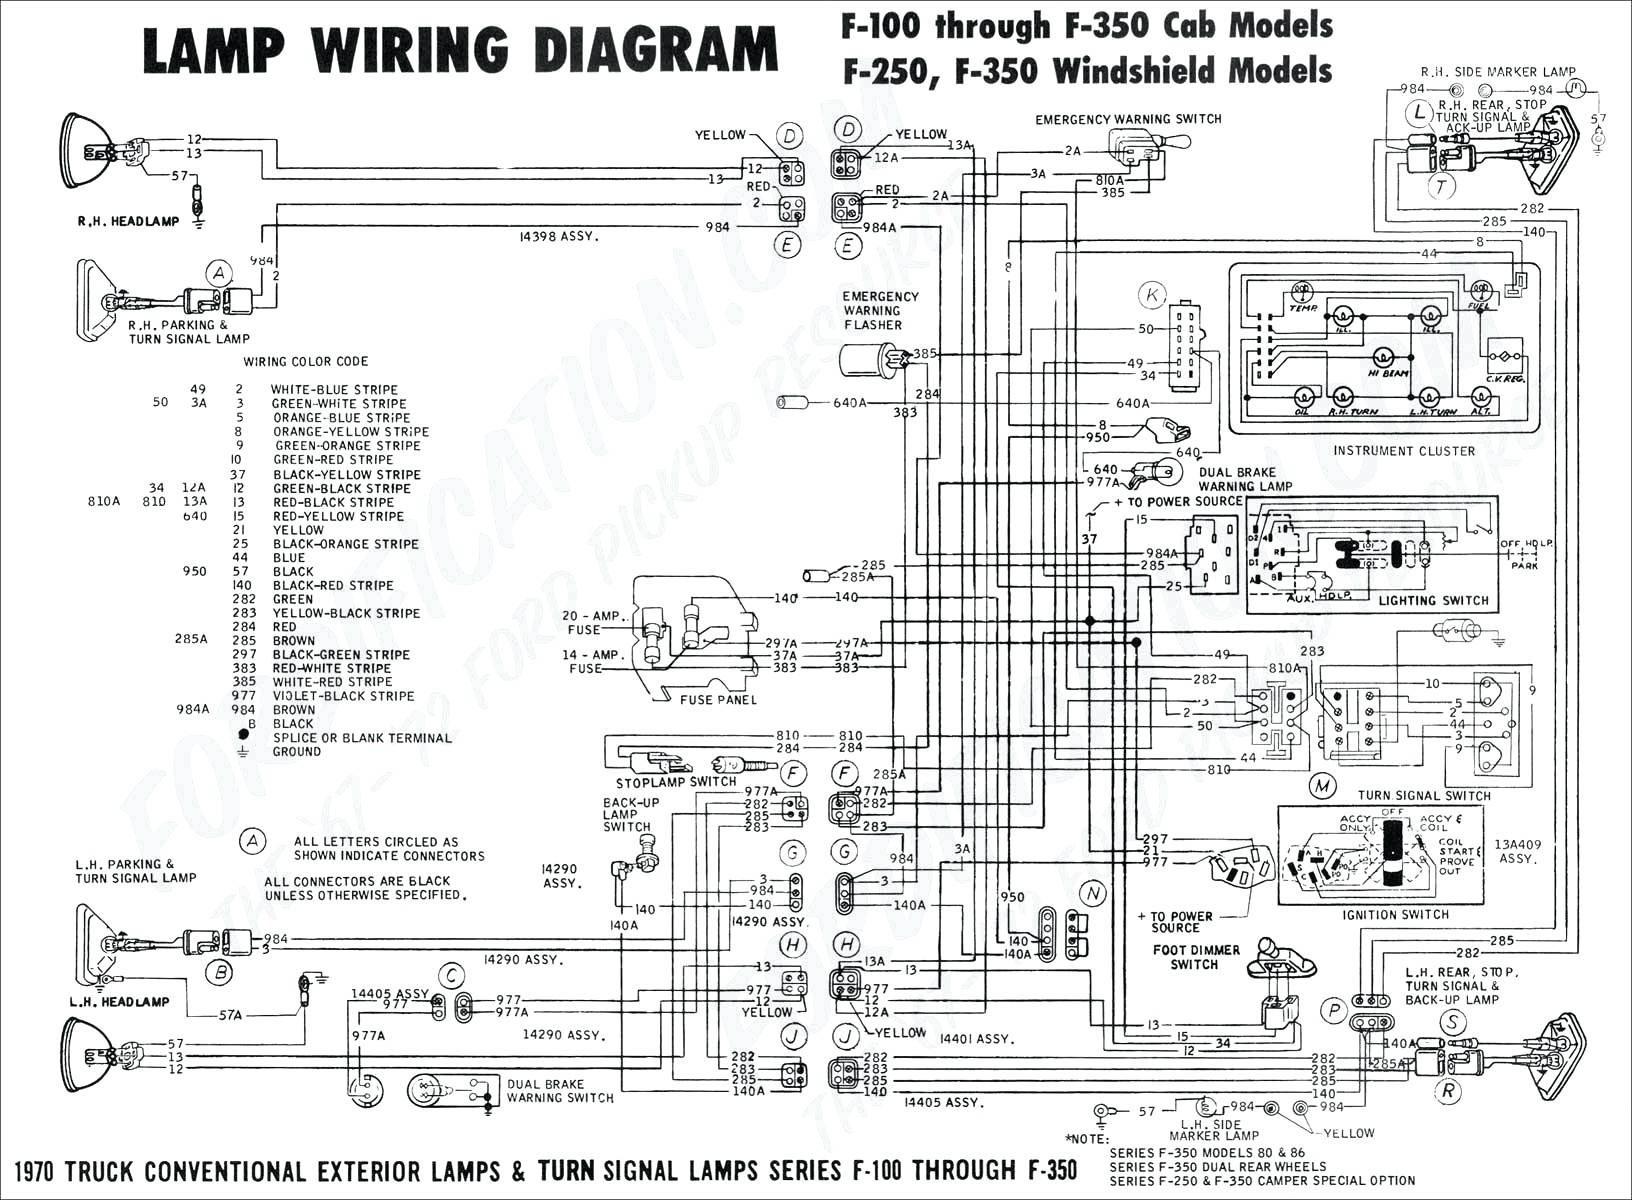 1986 ford f150 engine wiring diagram 85 k10 wiring